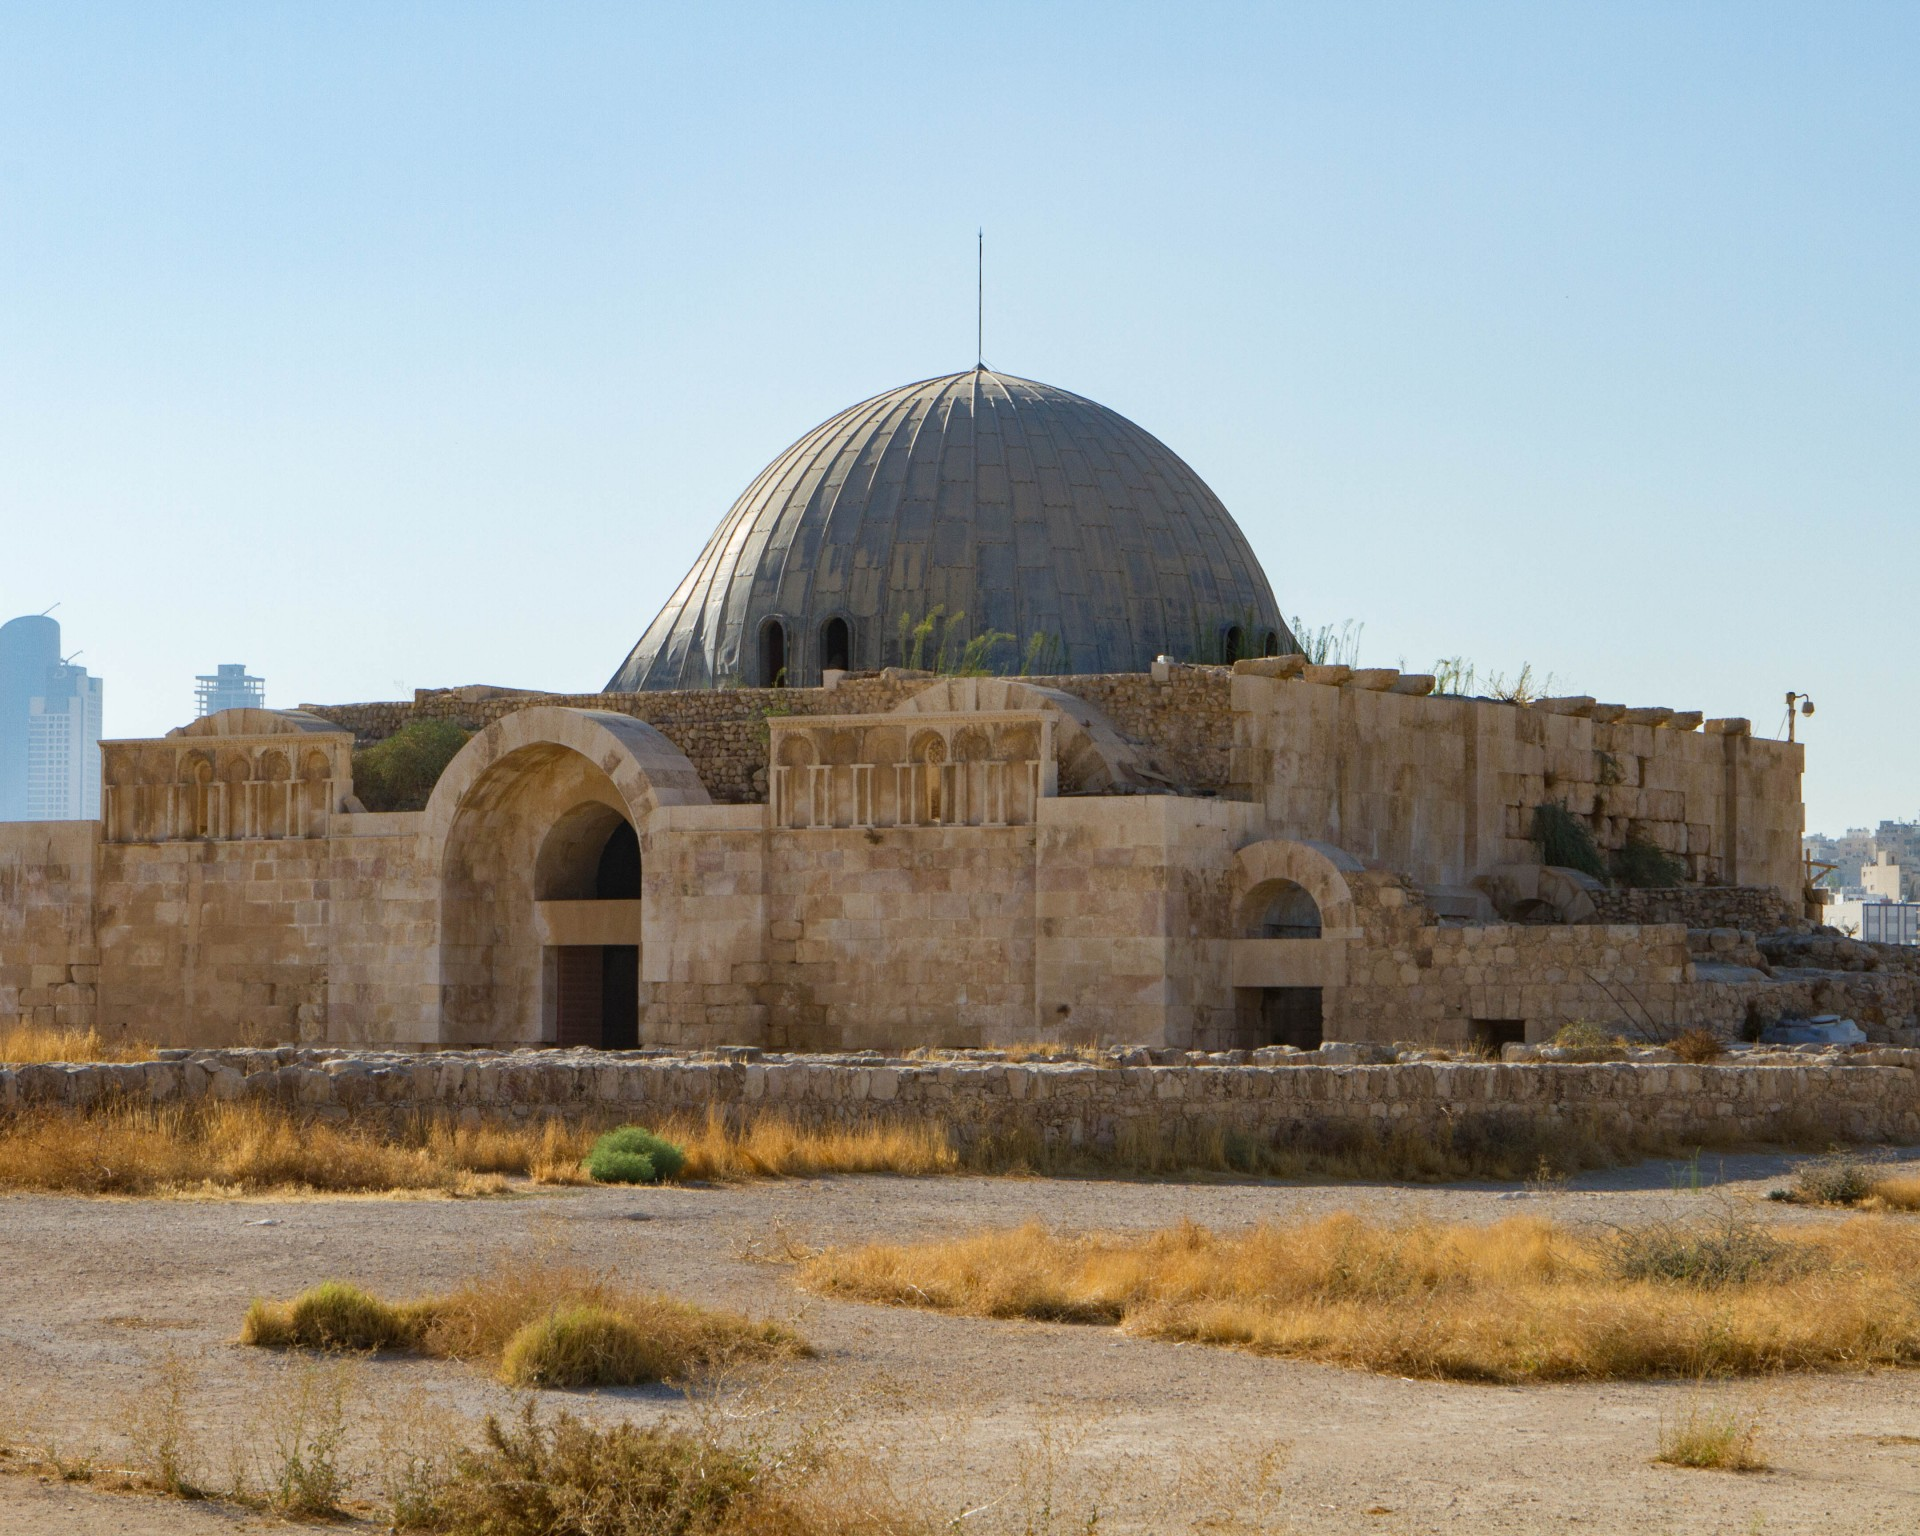 Amman Citadel - Umayyad Palace